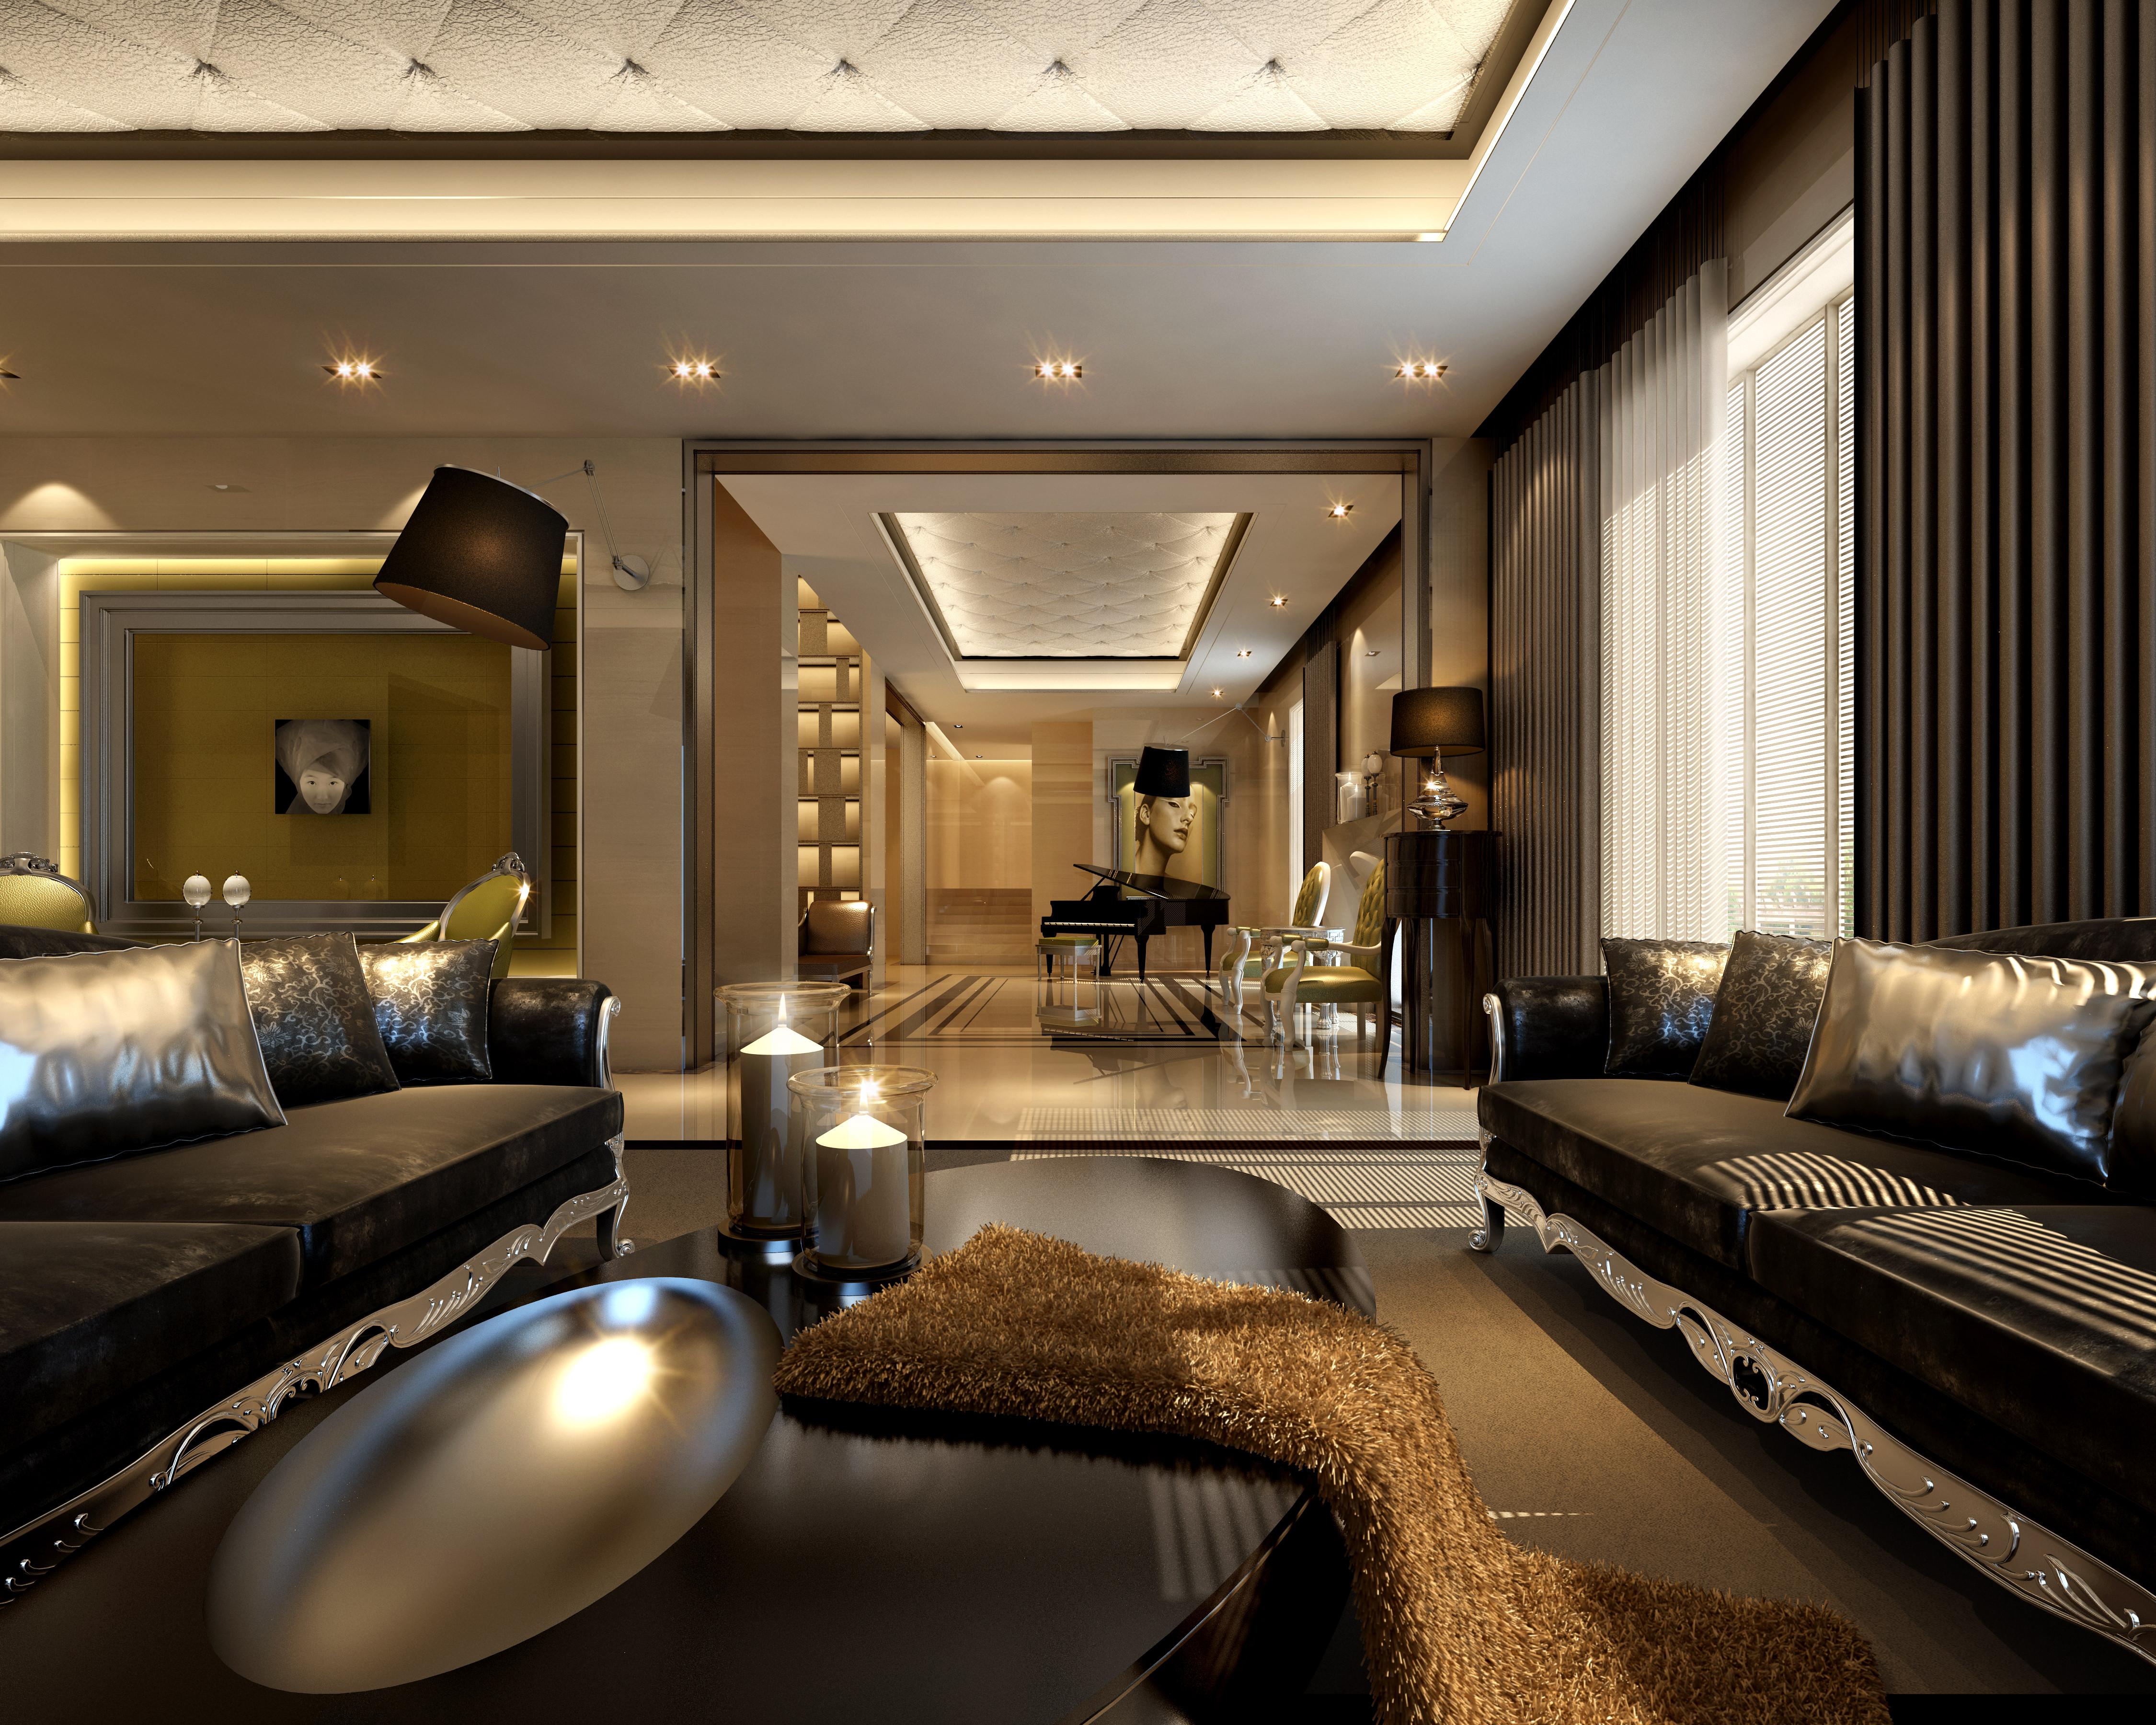 living room design 3d model  living-room Elegant living room 3D model | CGTrader